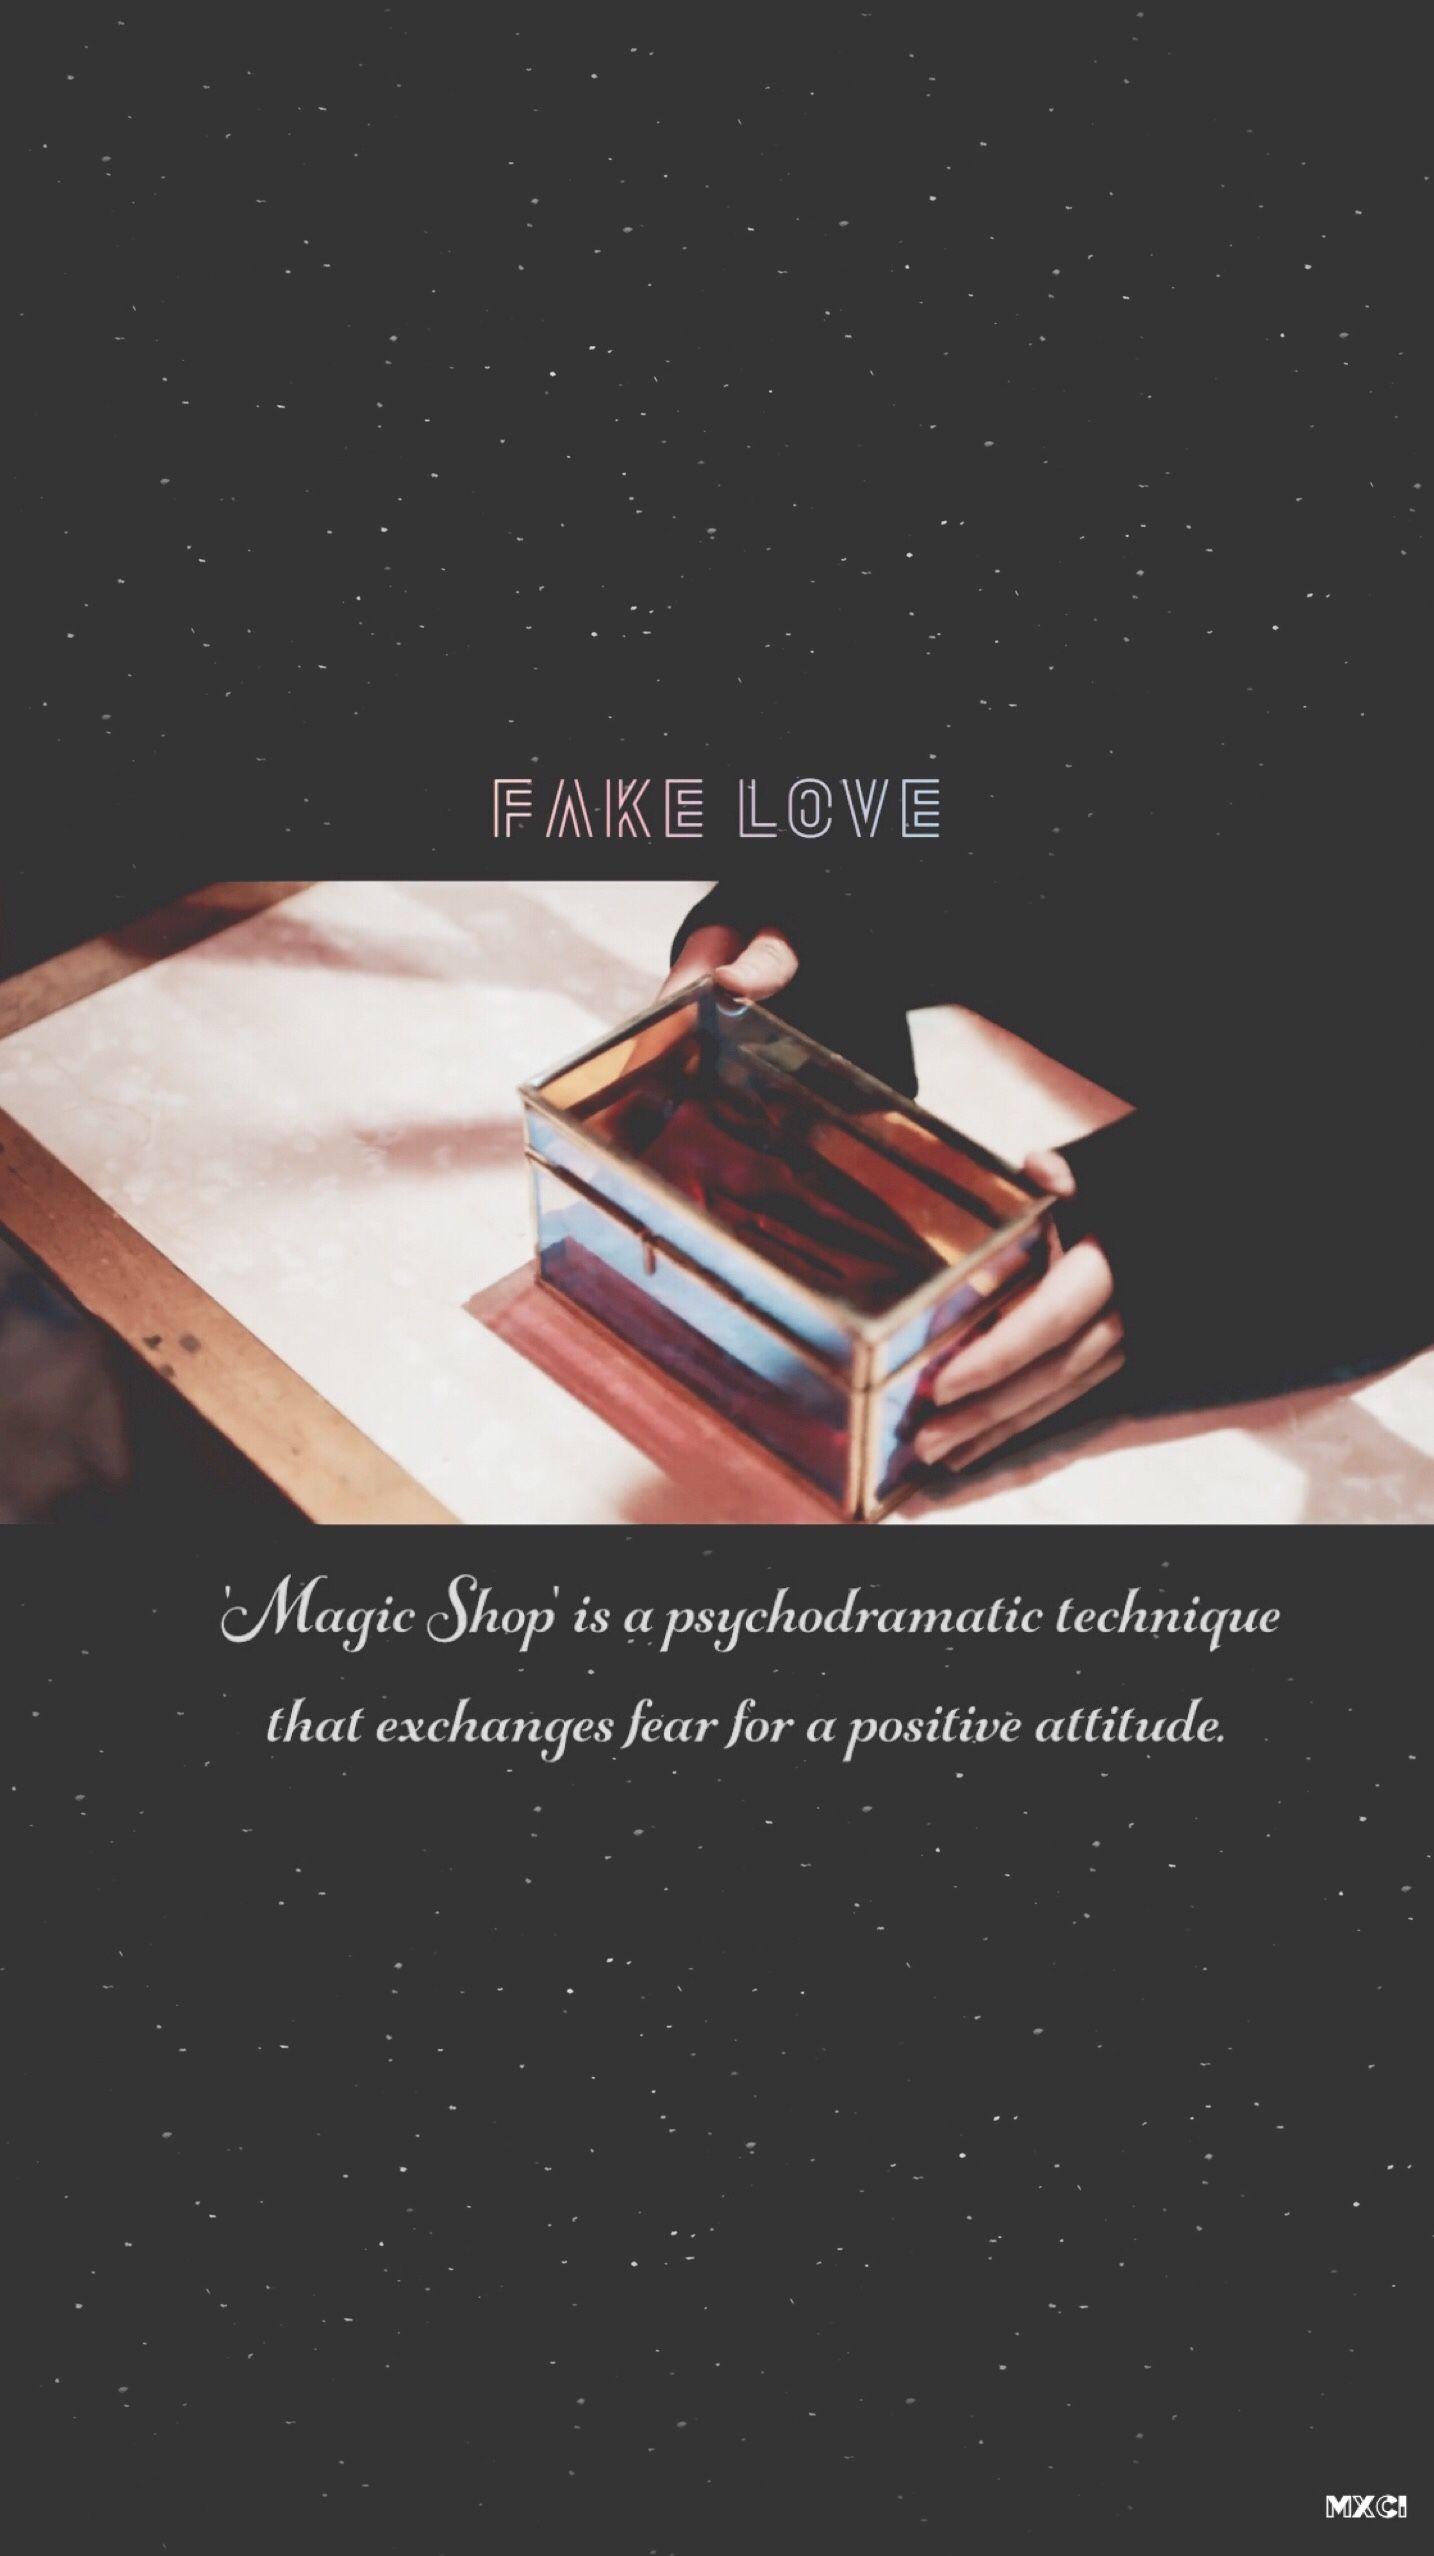 Bts Wallpaper Lytear Fake Love Teaser Bts In 2019 Bts - Fake Love Lyrics Bts , HD Wallpaper & Backgrounds